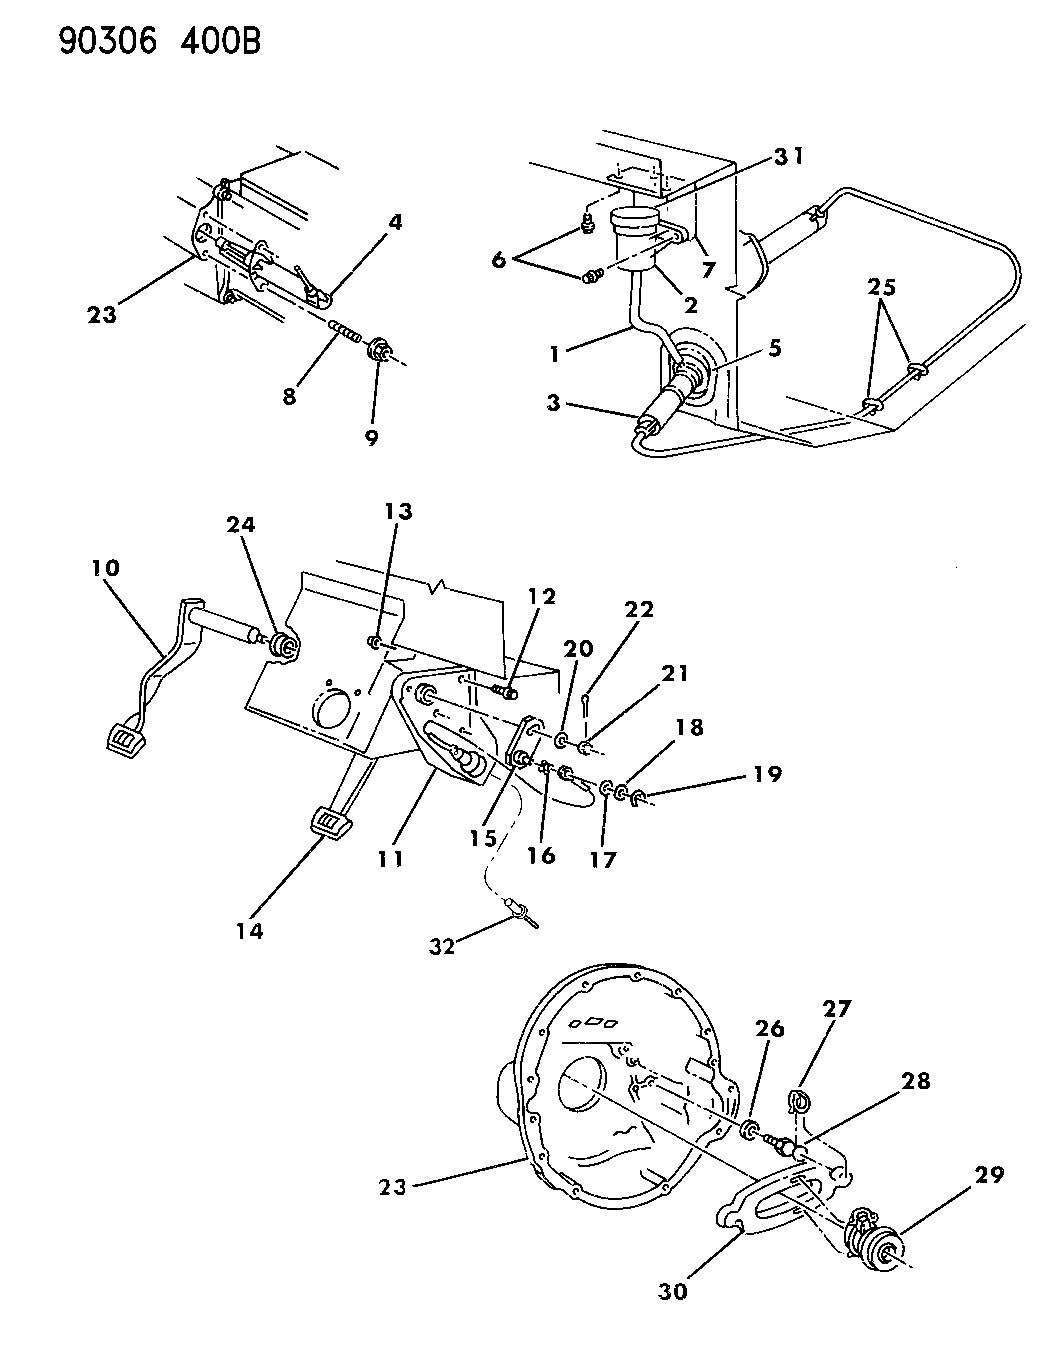 actuator wiring diagram likewise door lock actuator wiring diagram